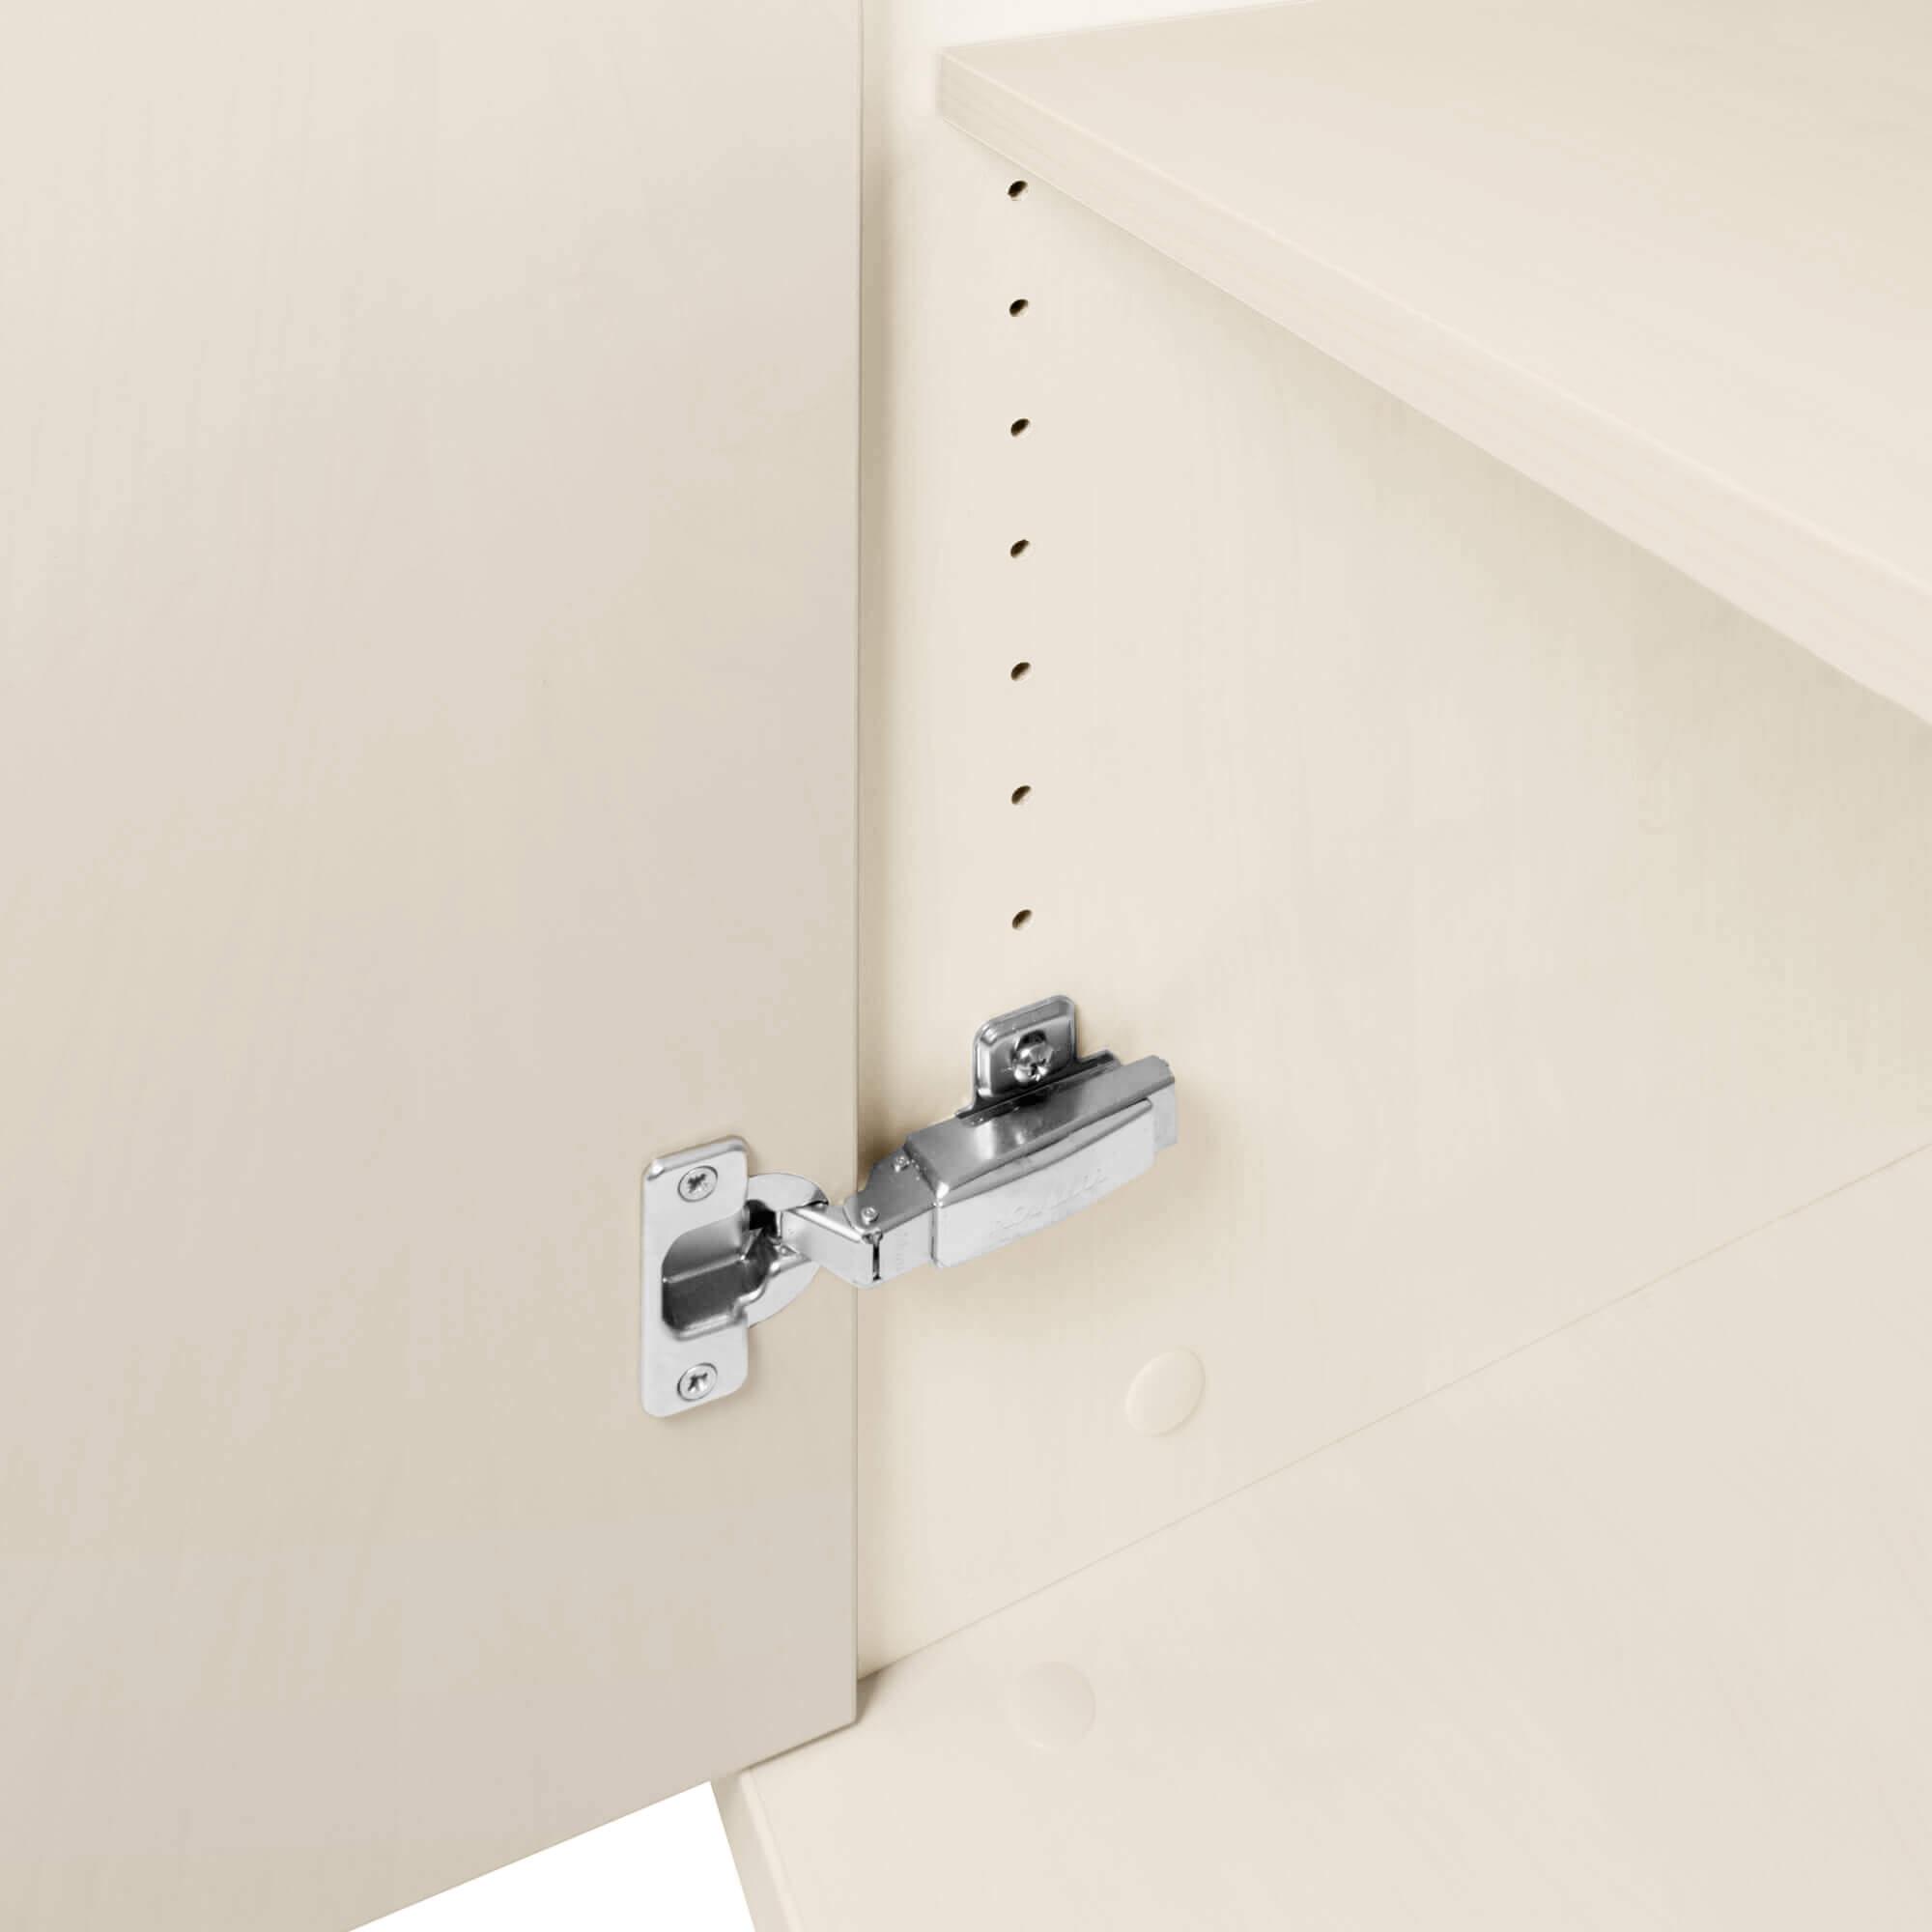 PROFI Schrankwand abschließbar Schrank Büroschrank Flügeltürenschrank Regalschrank Ahorn